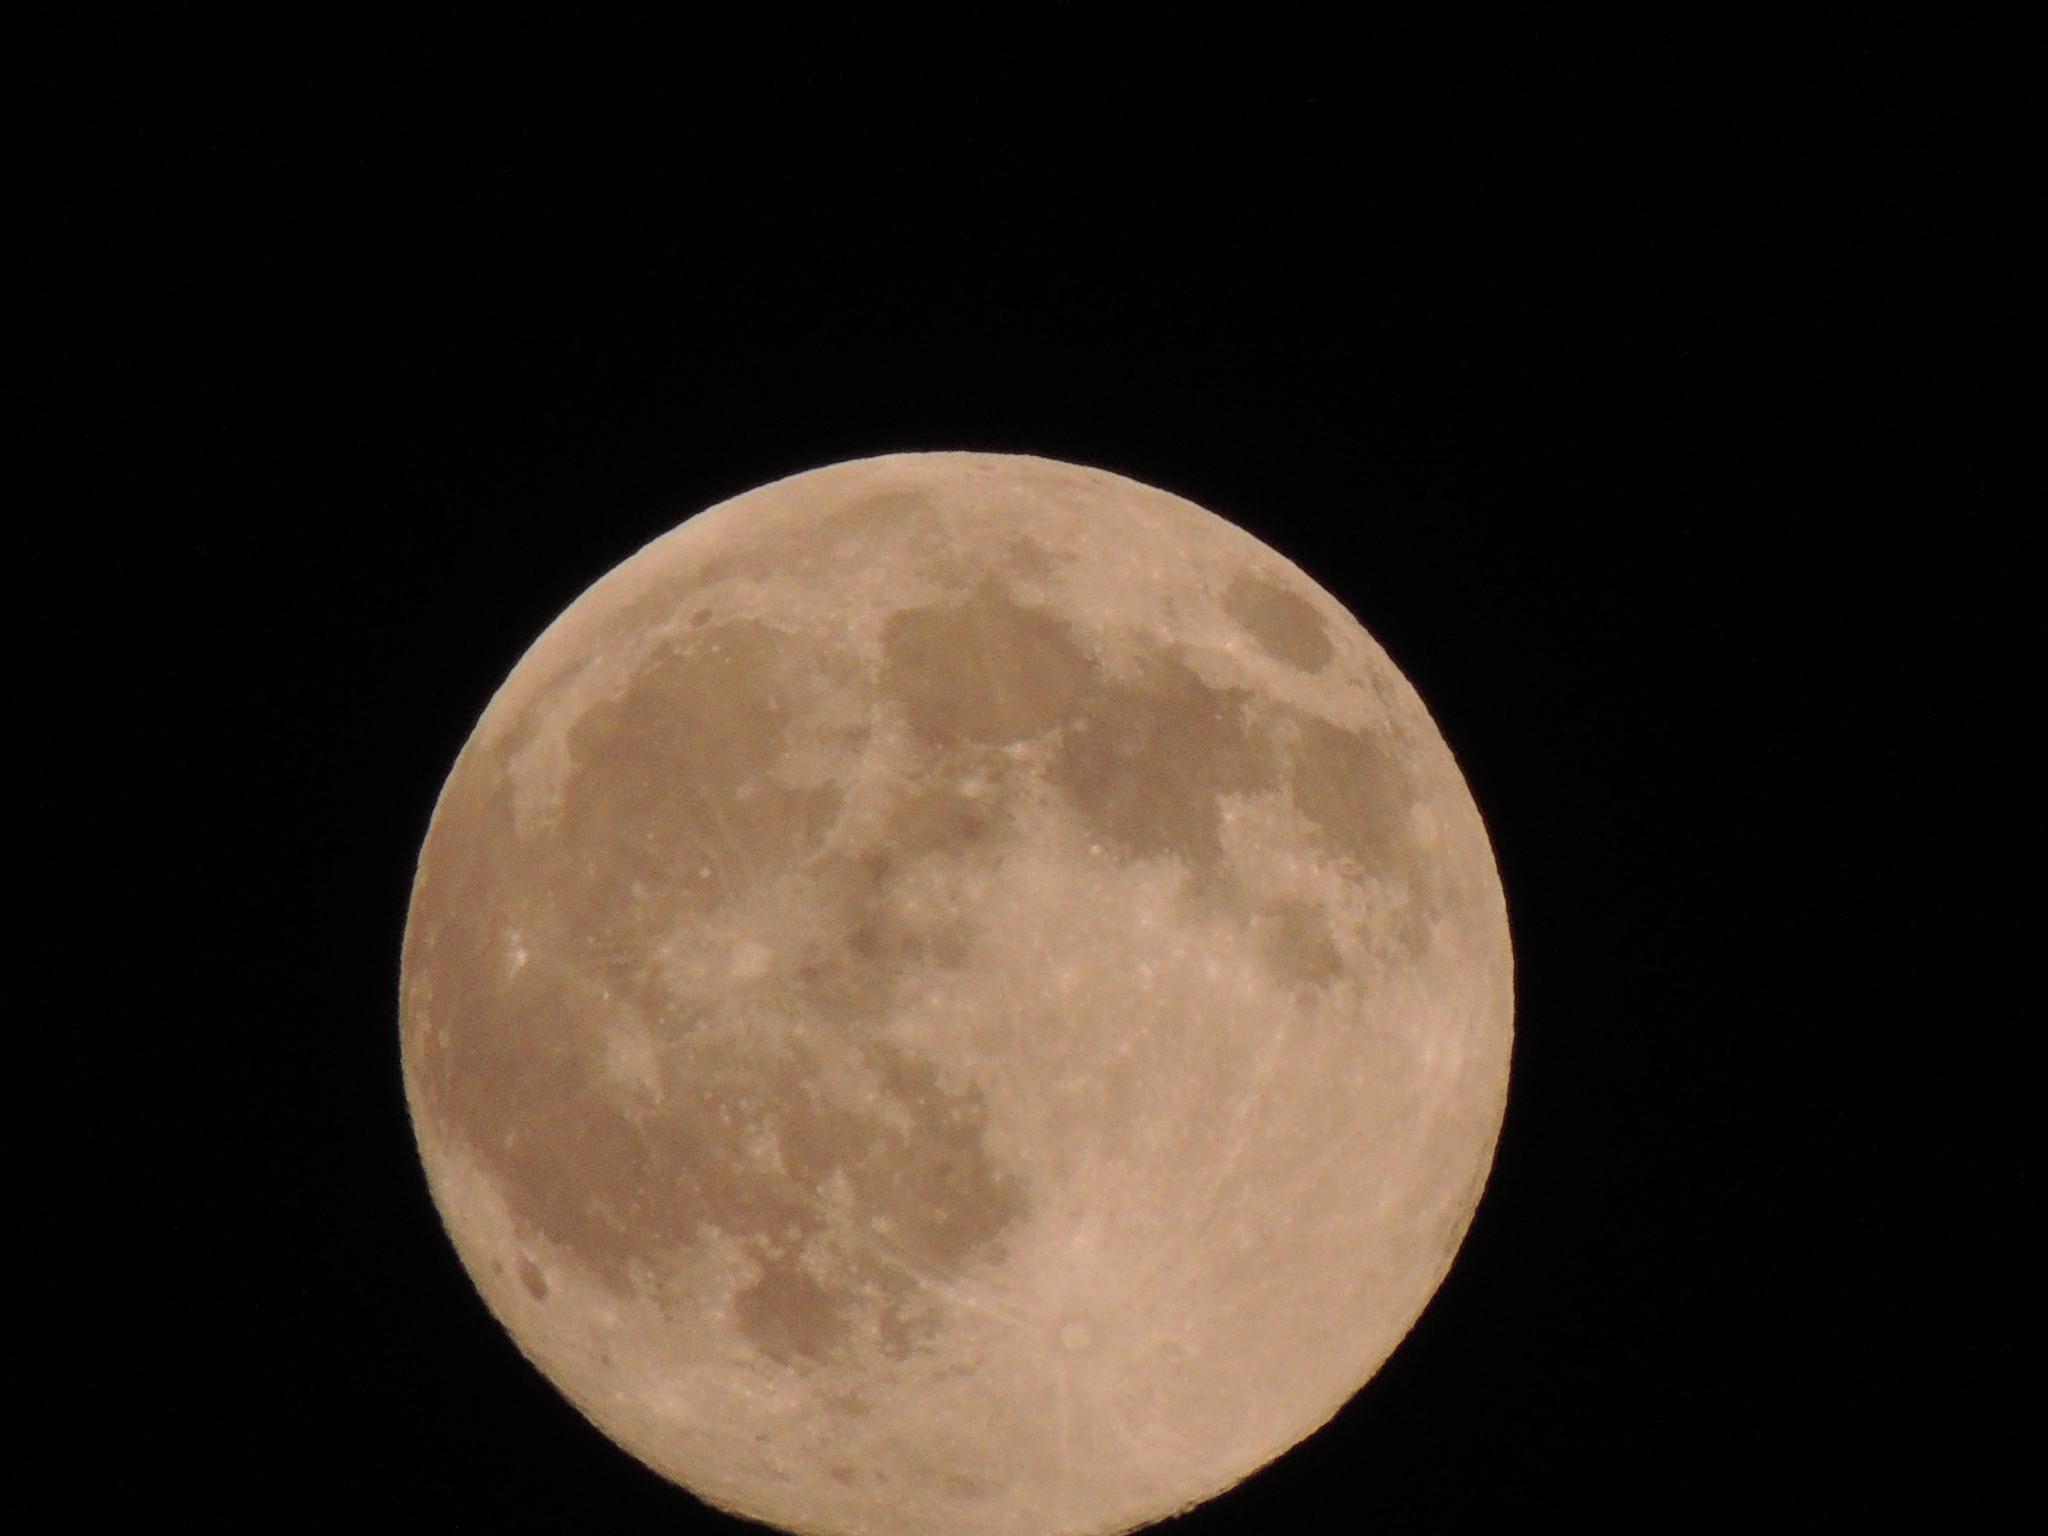 blue moon 7-30-2015 by robbin.allen.nevills